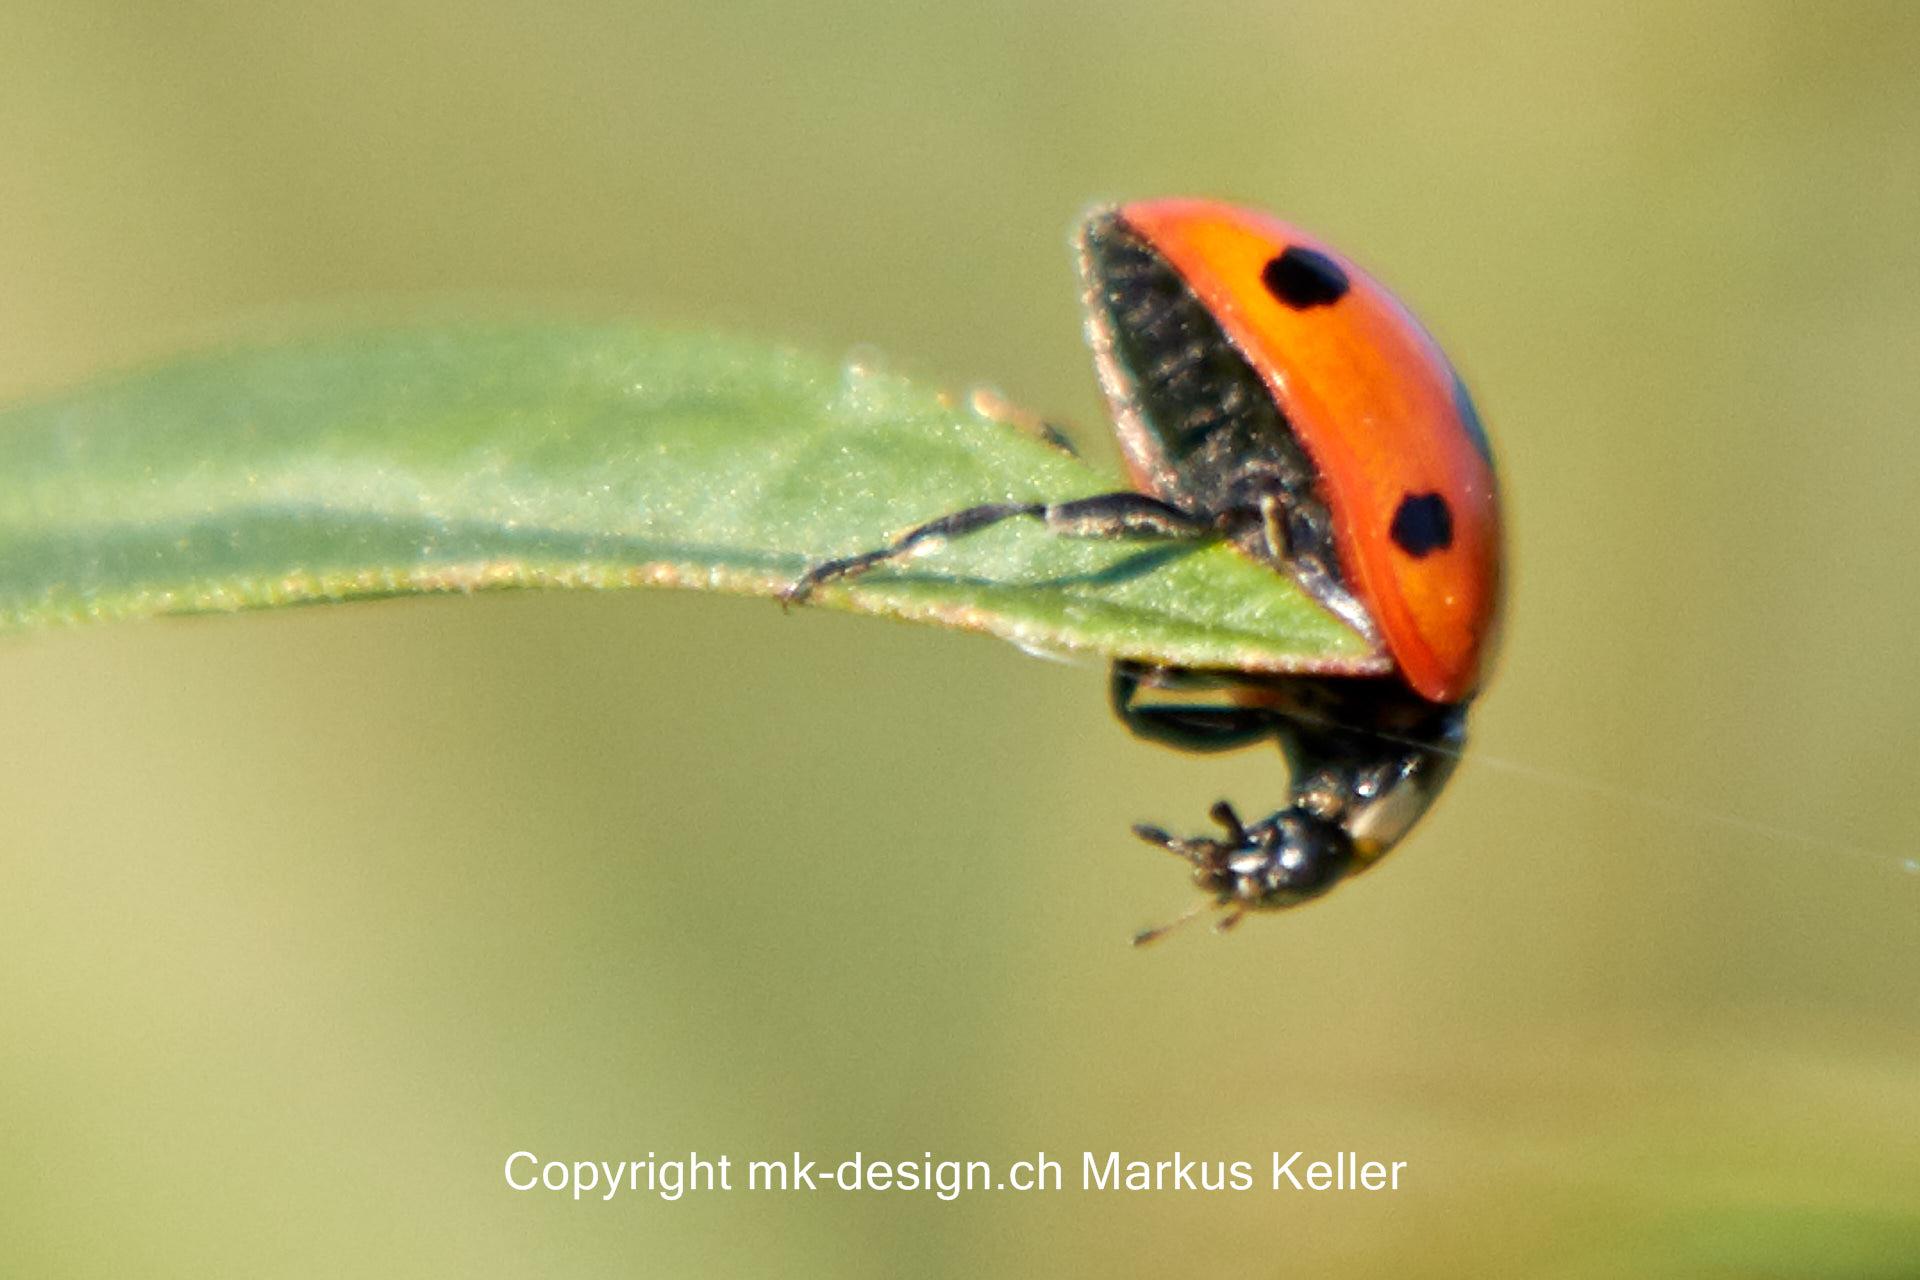 Tier   Insekte   Käfer   Marienkäfer